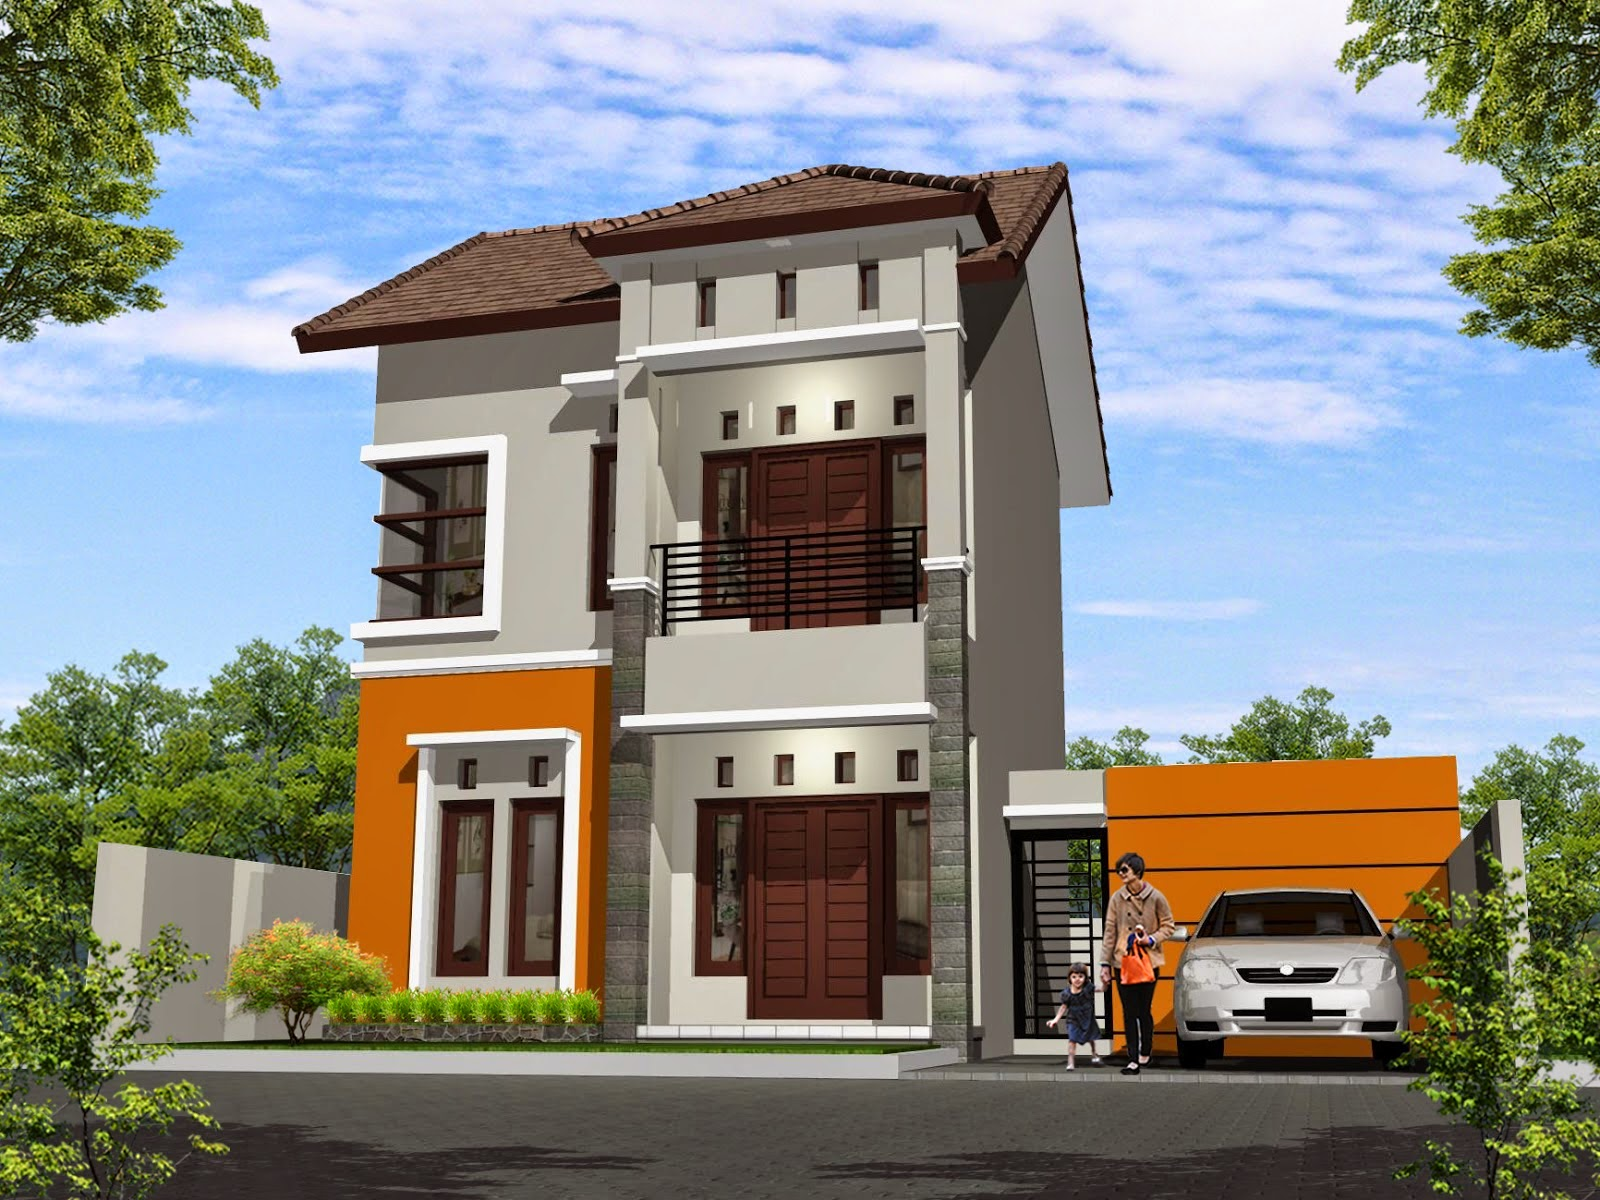 Bangun Rumah 2 Lantai 2014